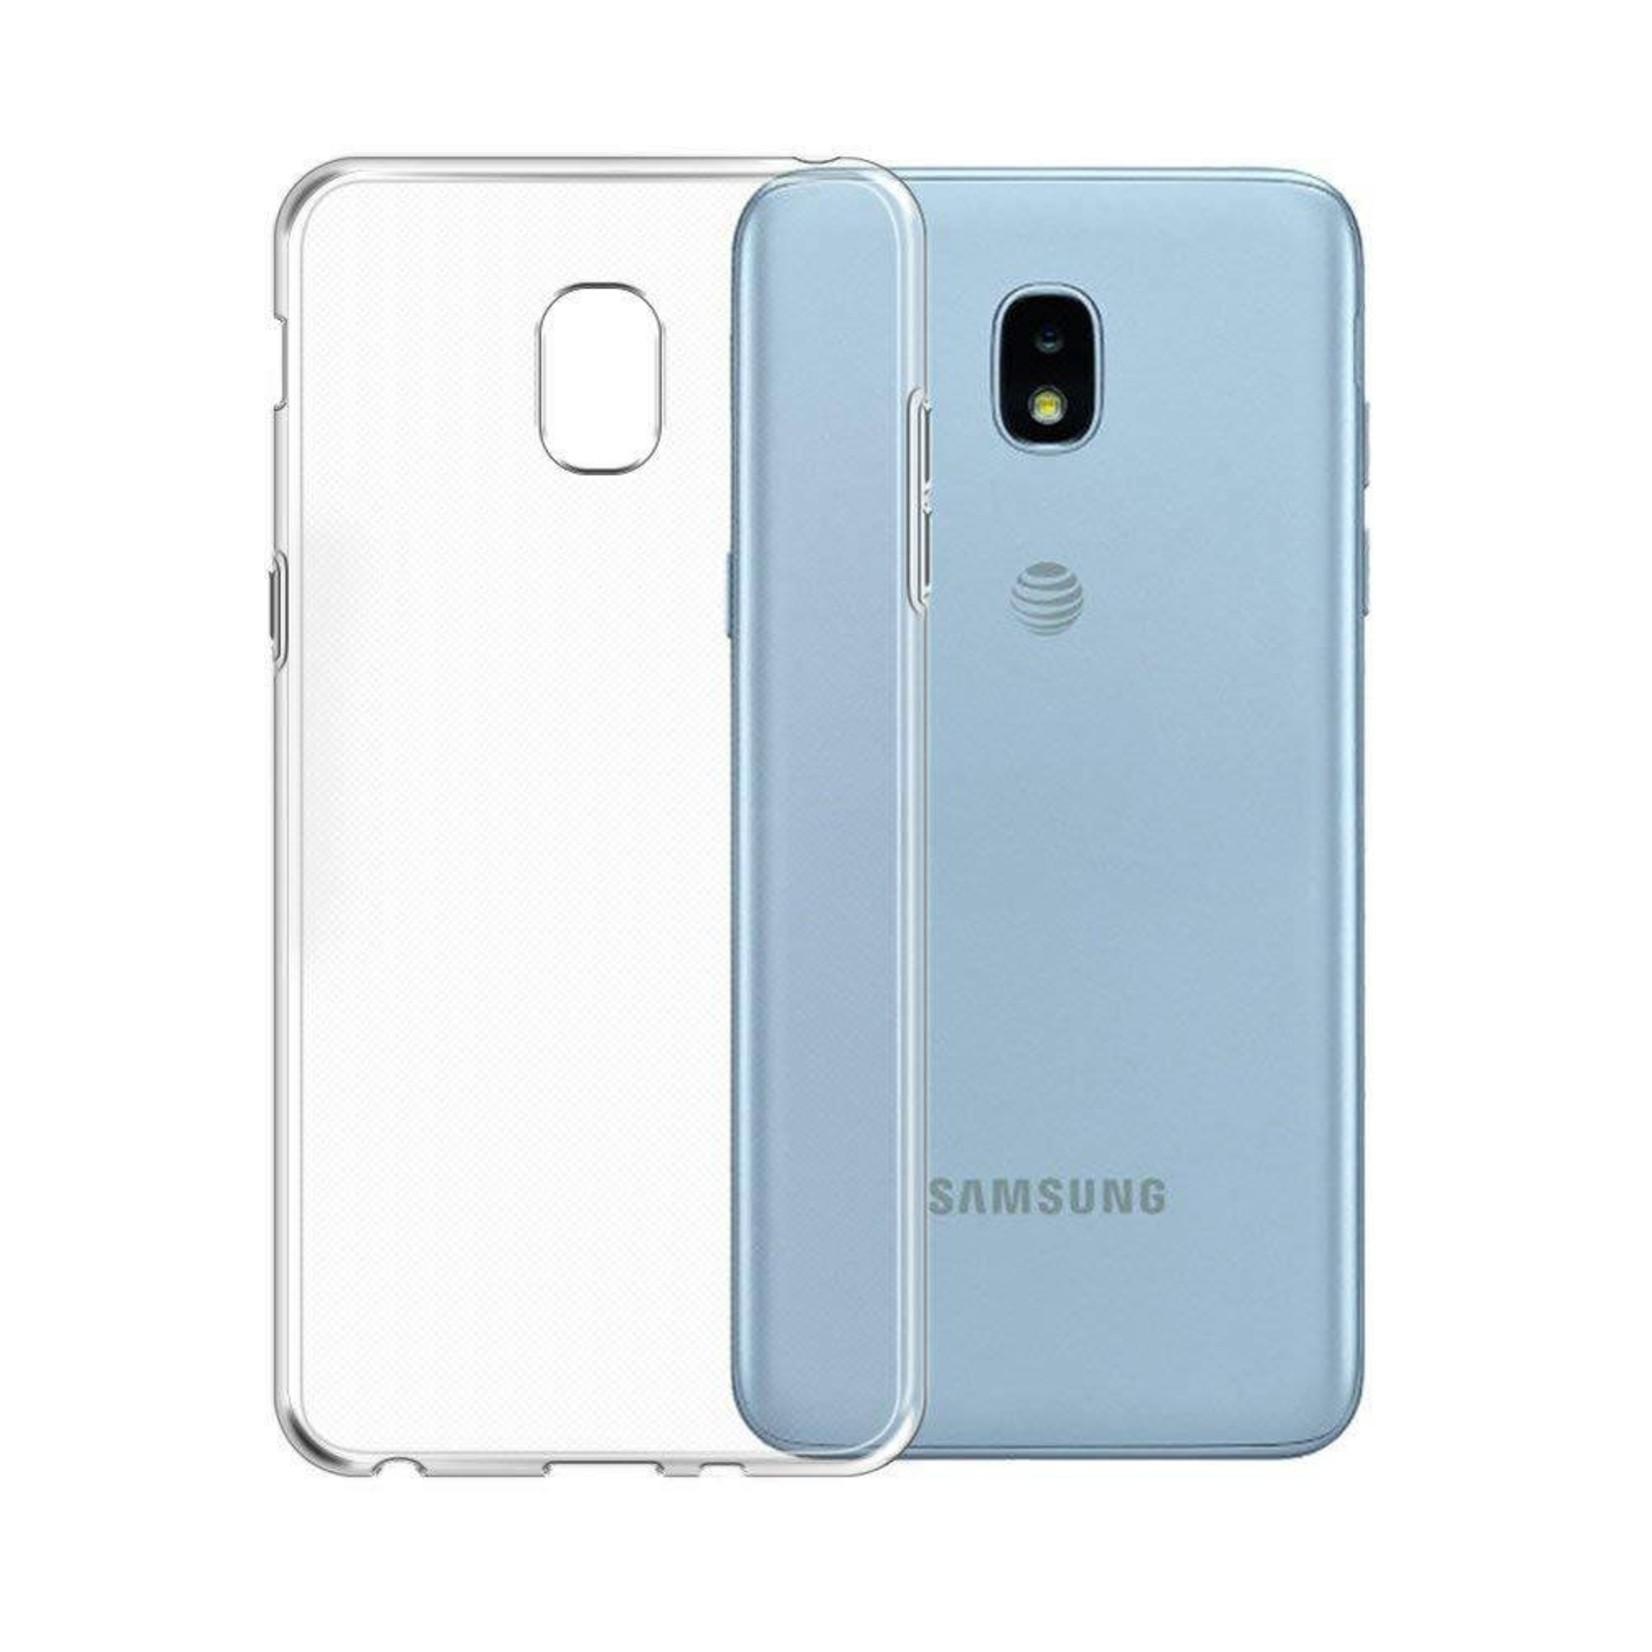 Colorfone Hoesje CoolSkin3T voor Samsung Galaxy J3 2018 Tr. Wit